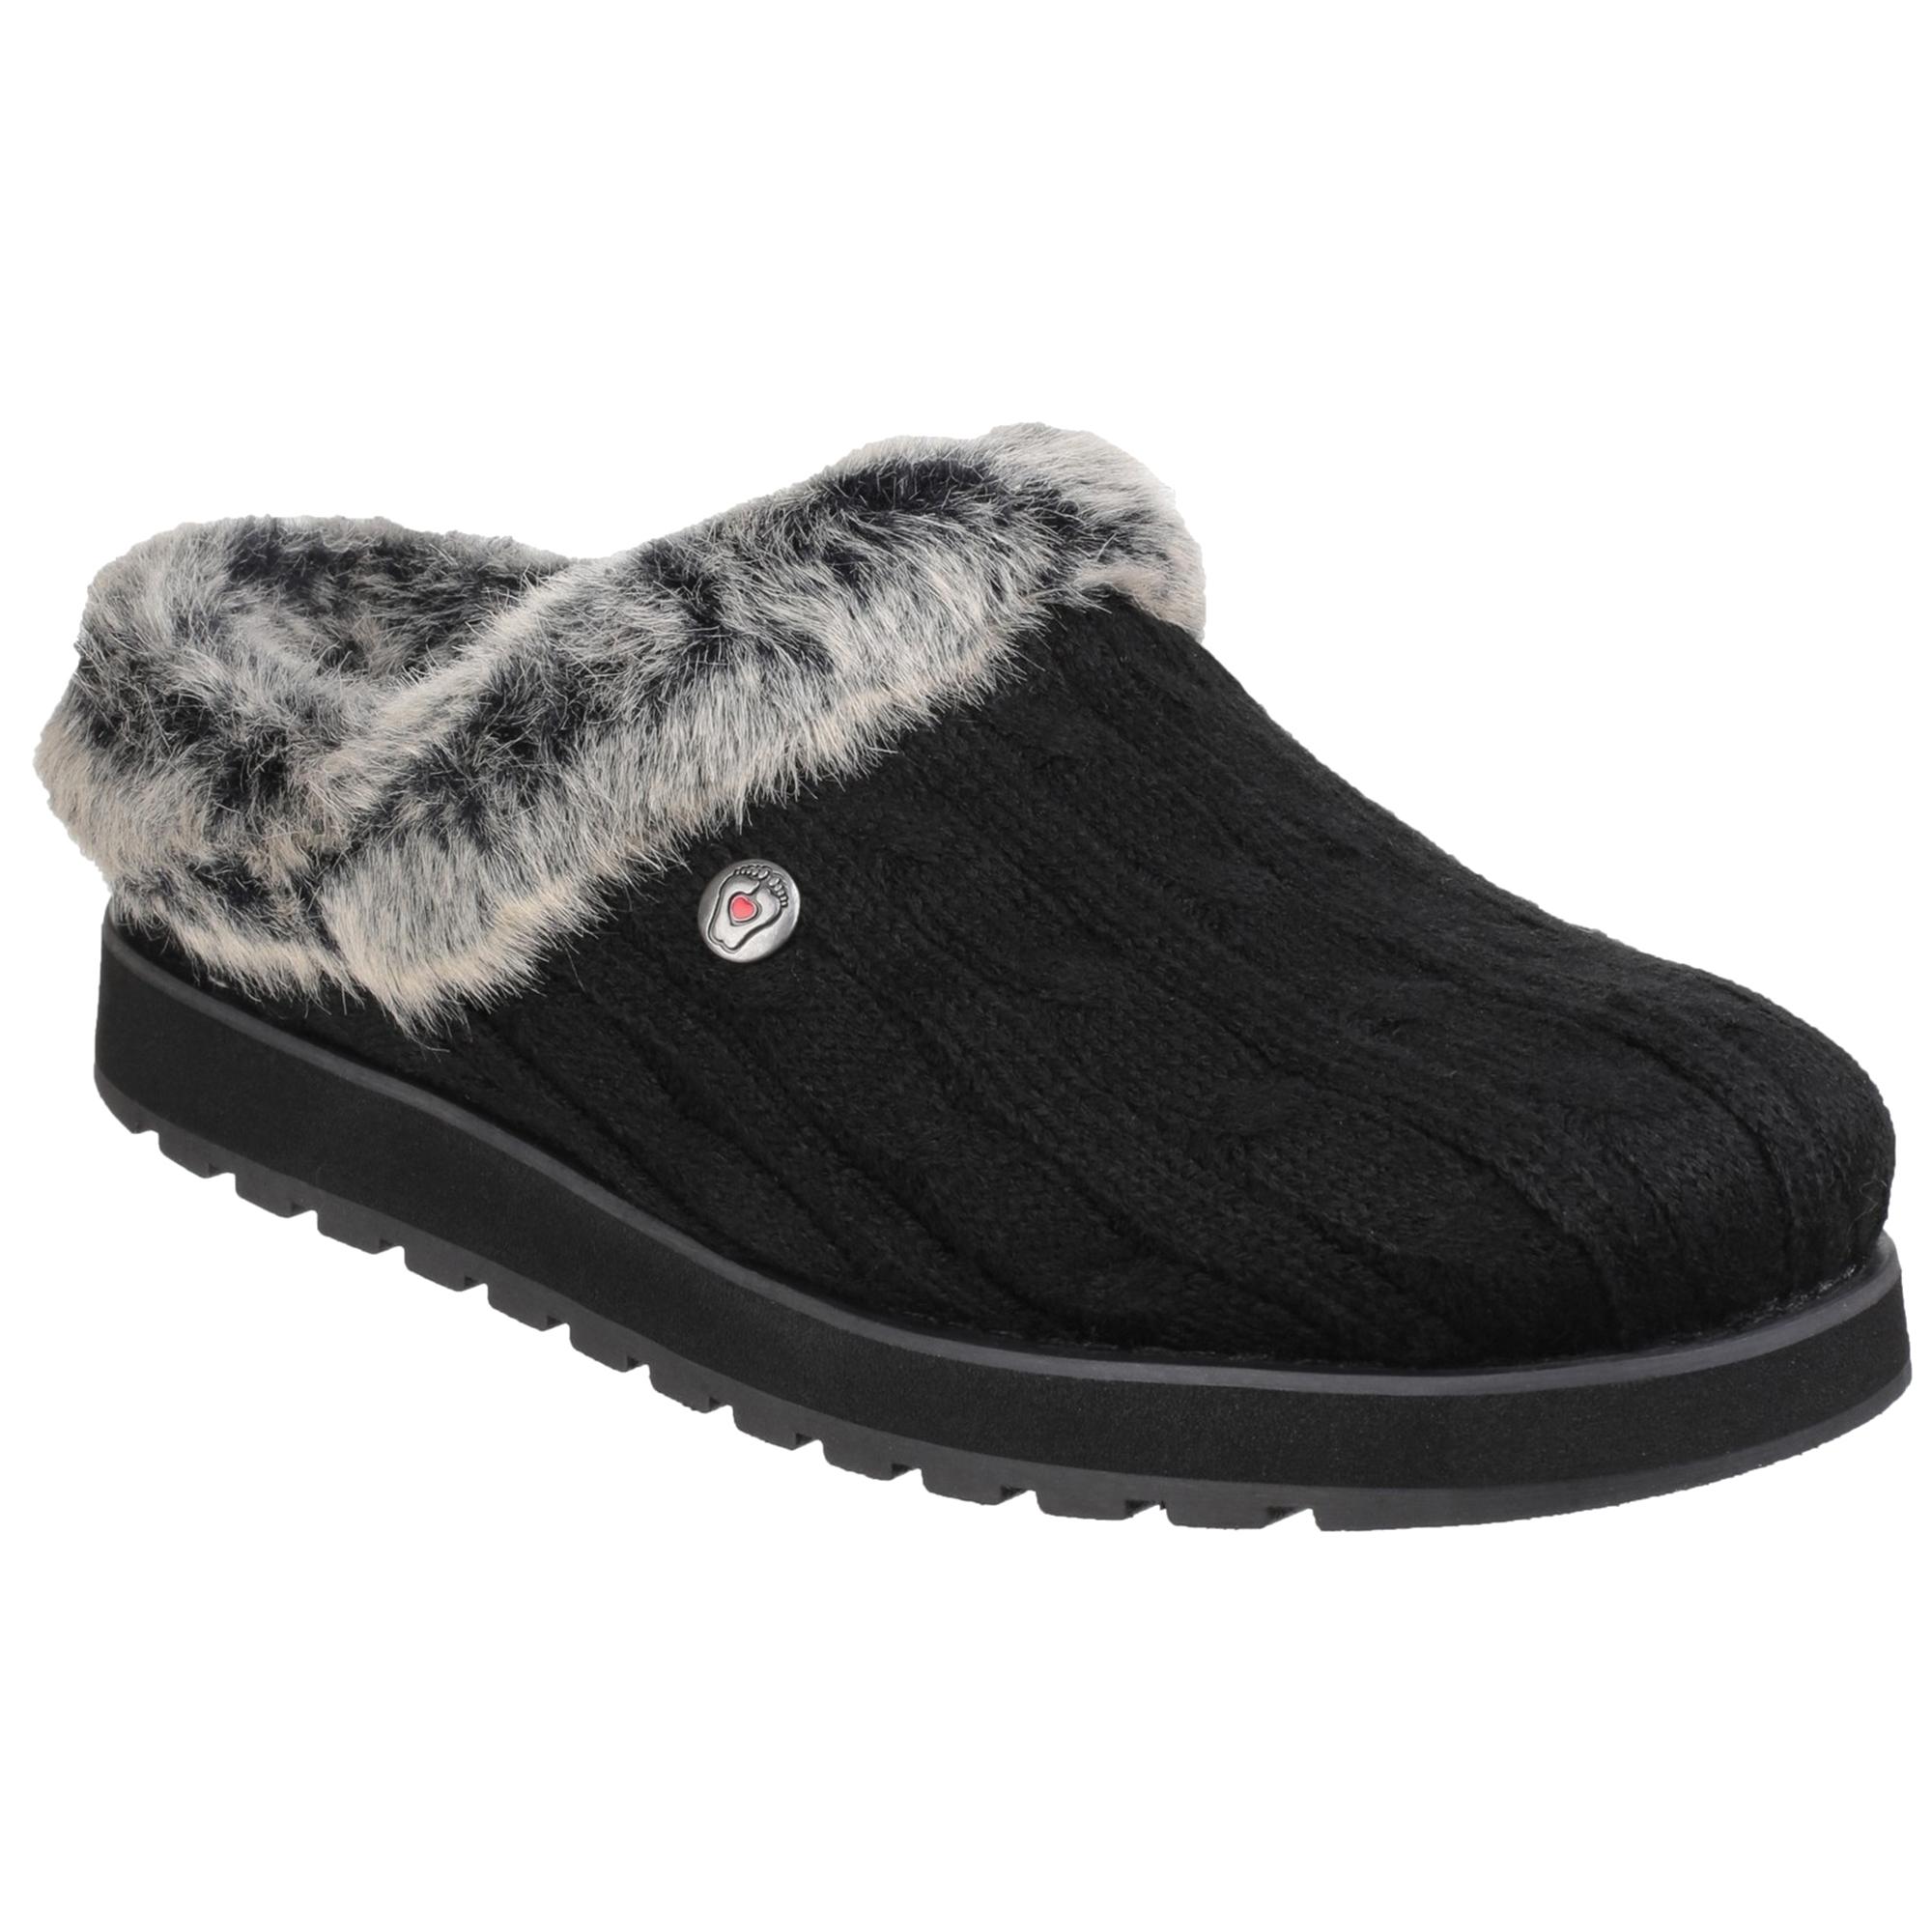 Dettagli su Skechers - Keepsakes Ice Angel - Pantofole invernali - Donna (FS4137)